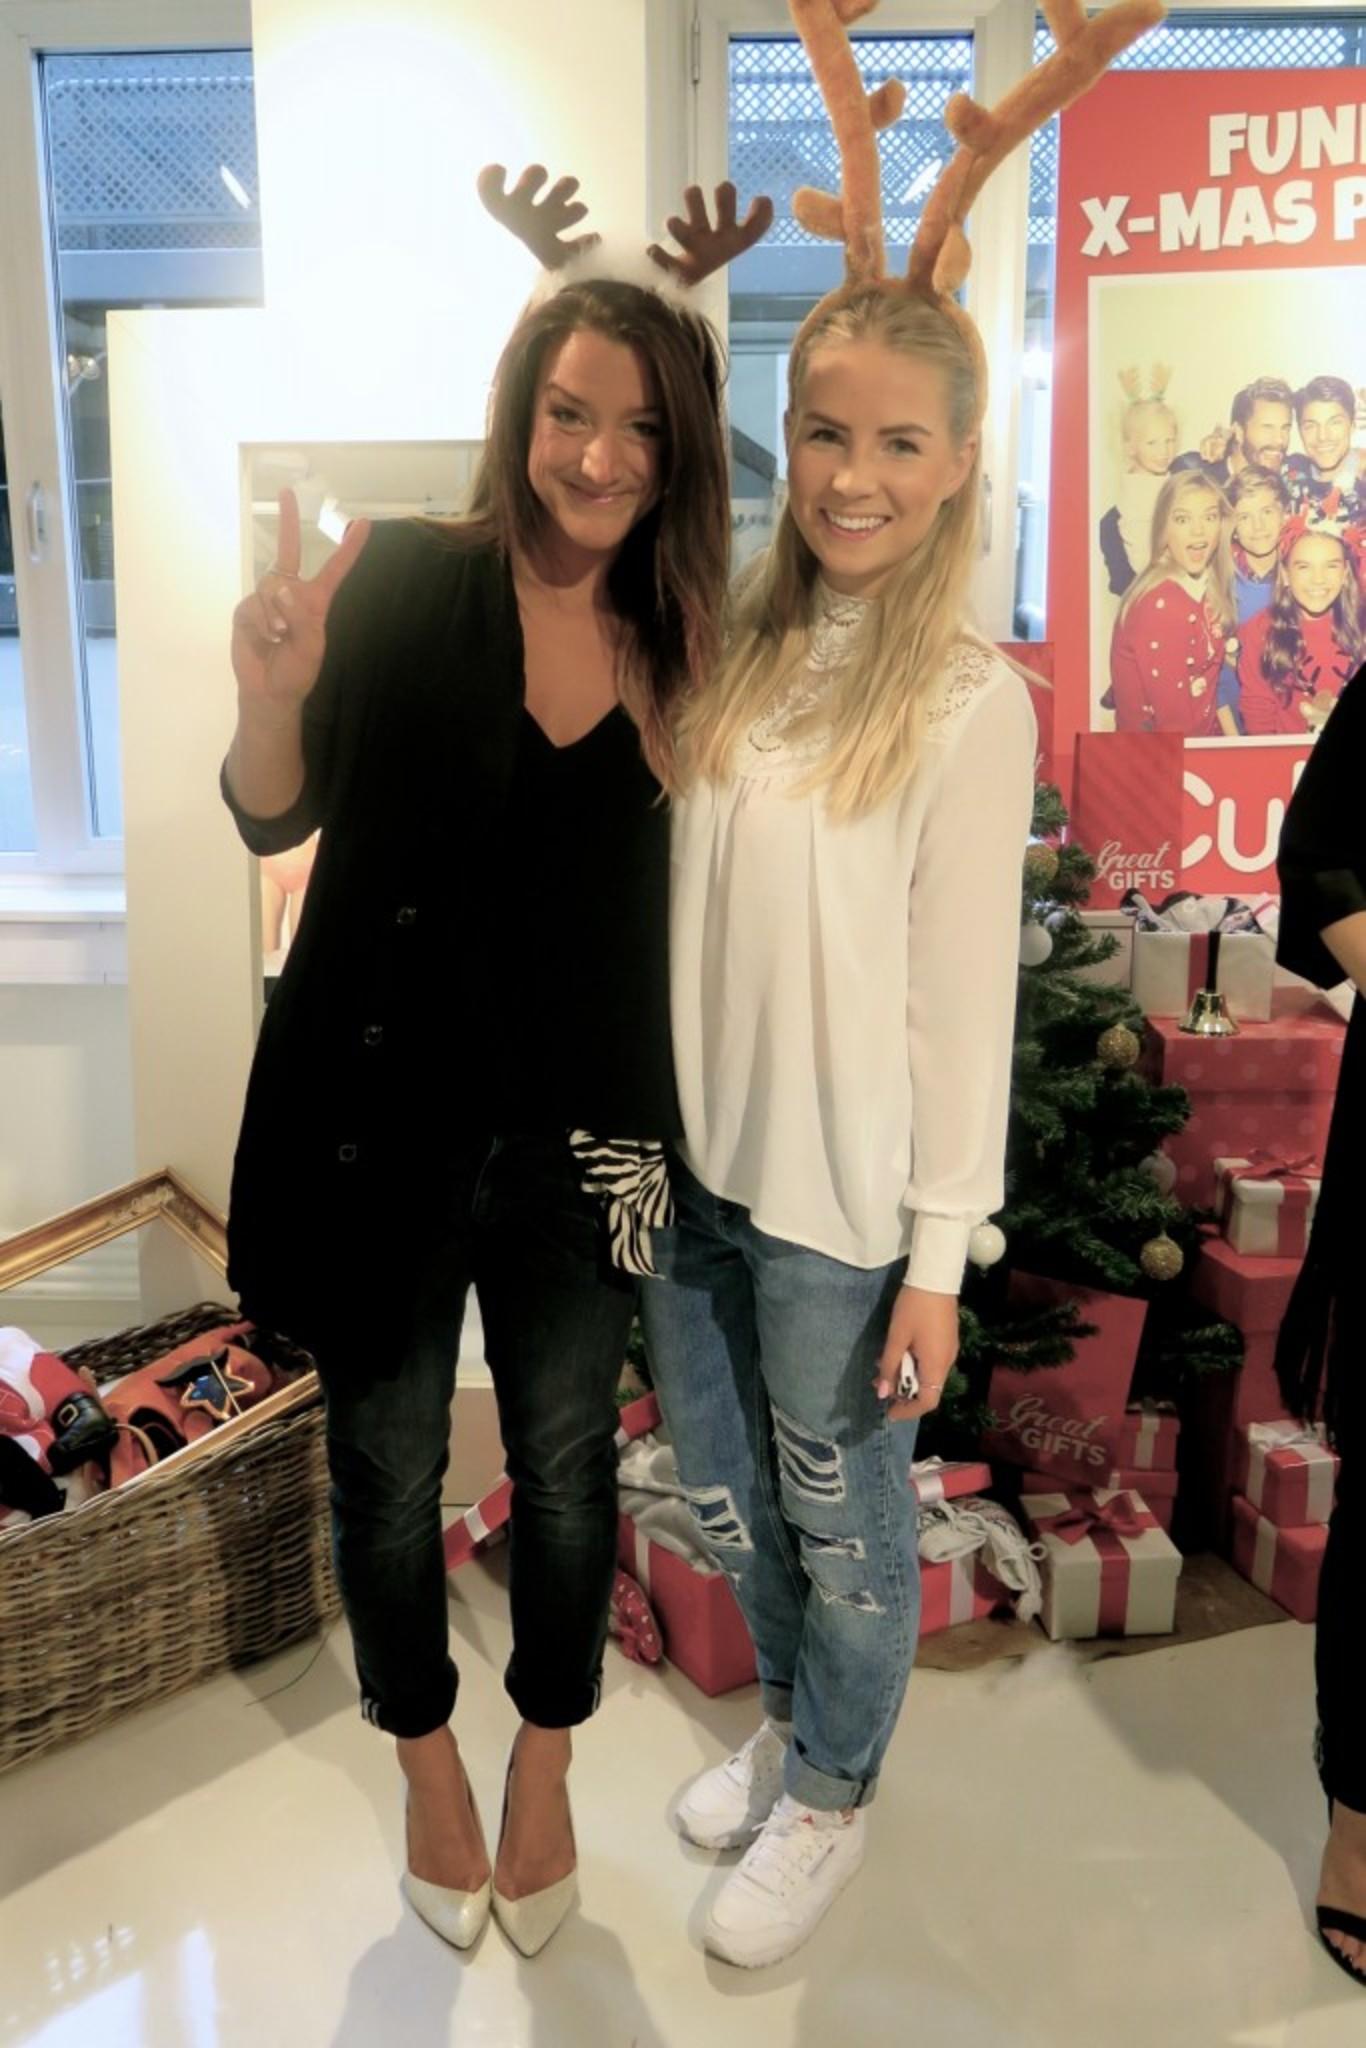 Gambit Girls! Julie & Mim <3